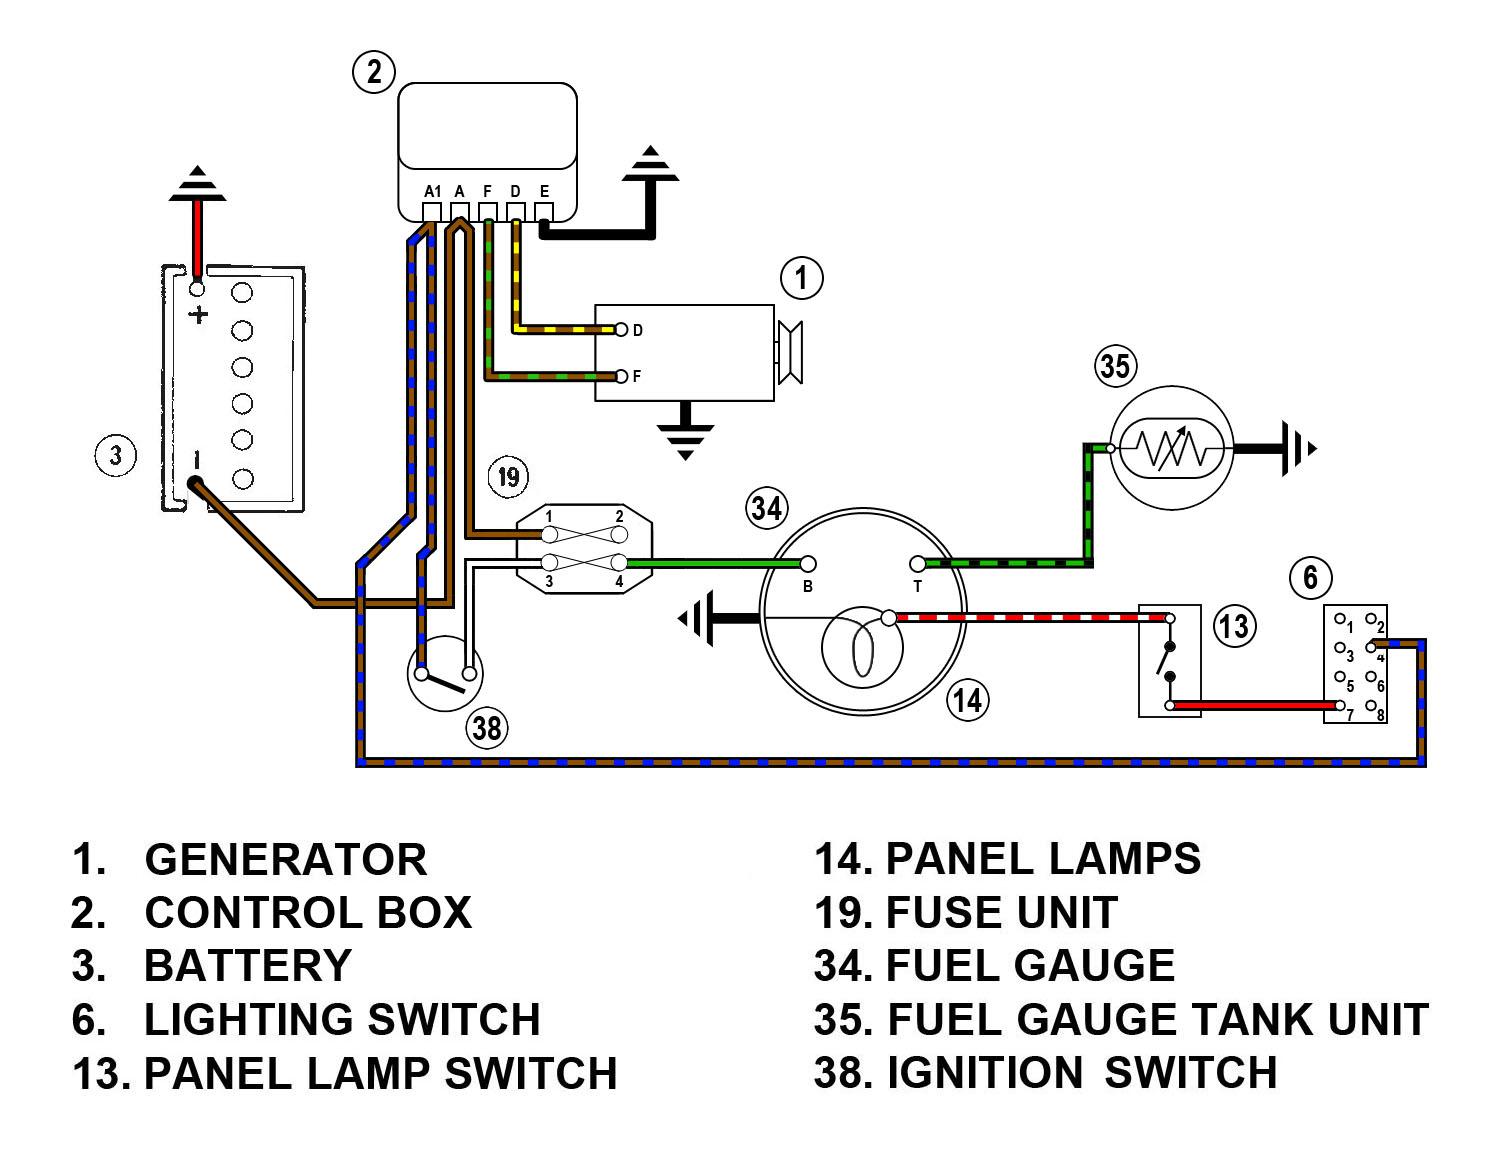 Marine Fuel Gauge Wiring Diagram | Wiring Diagram - Fuel Gauge Wiring Diagram